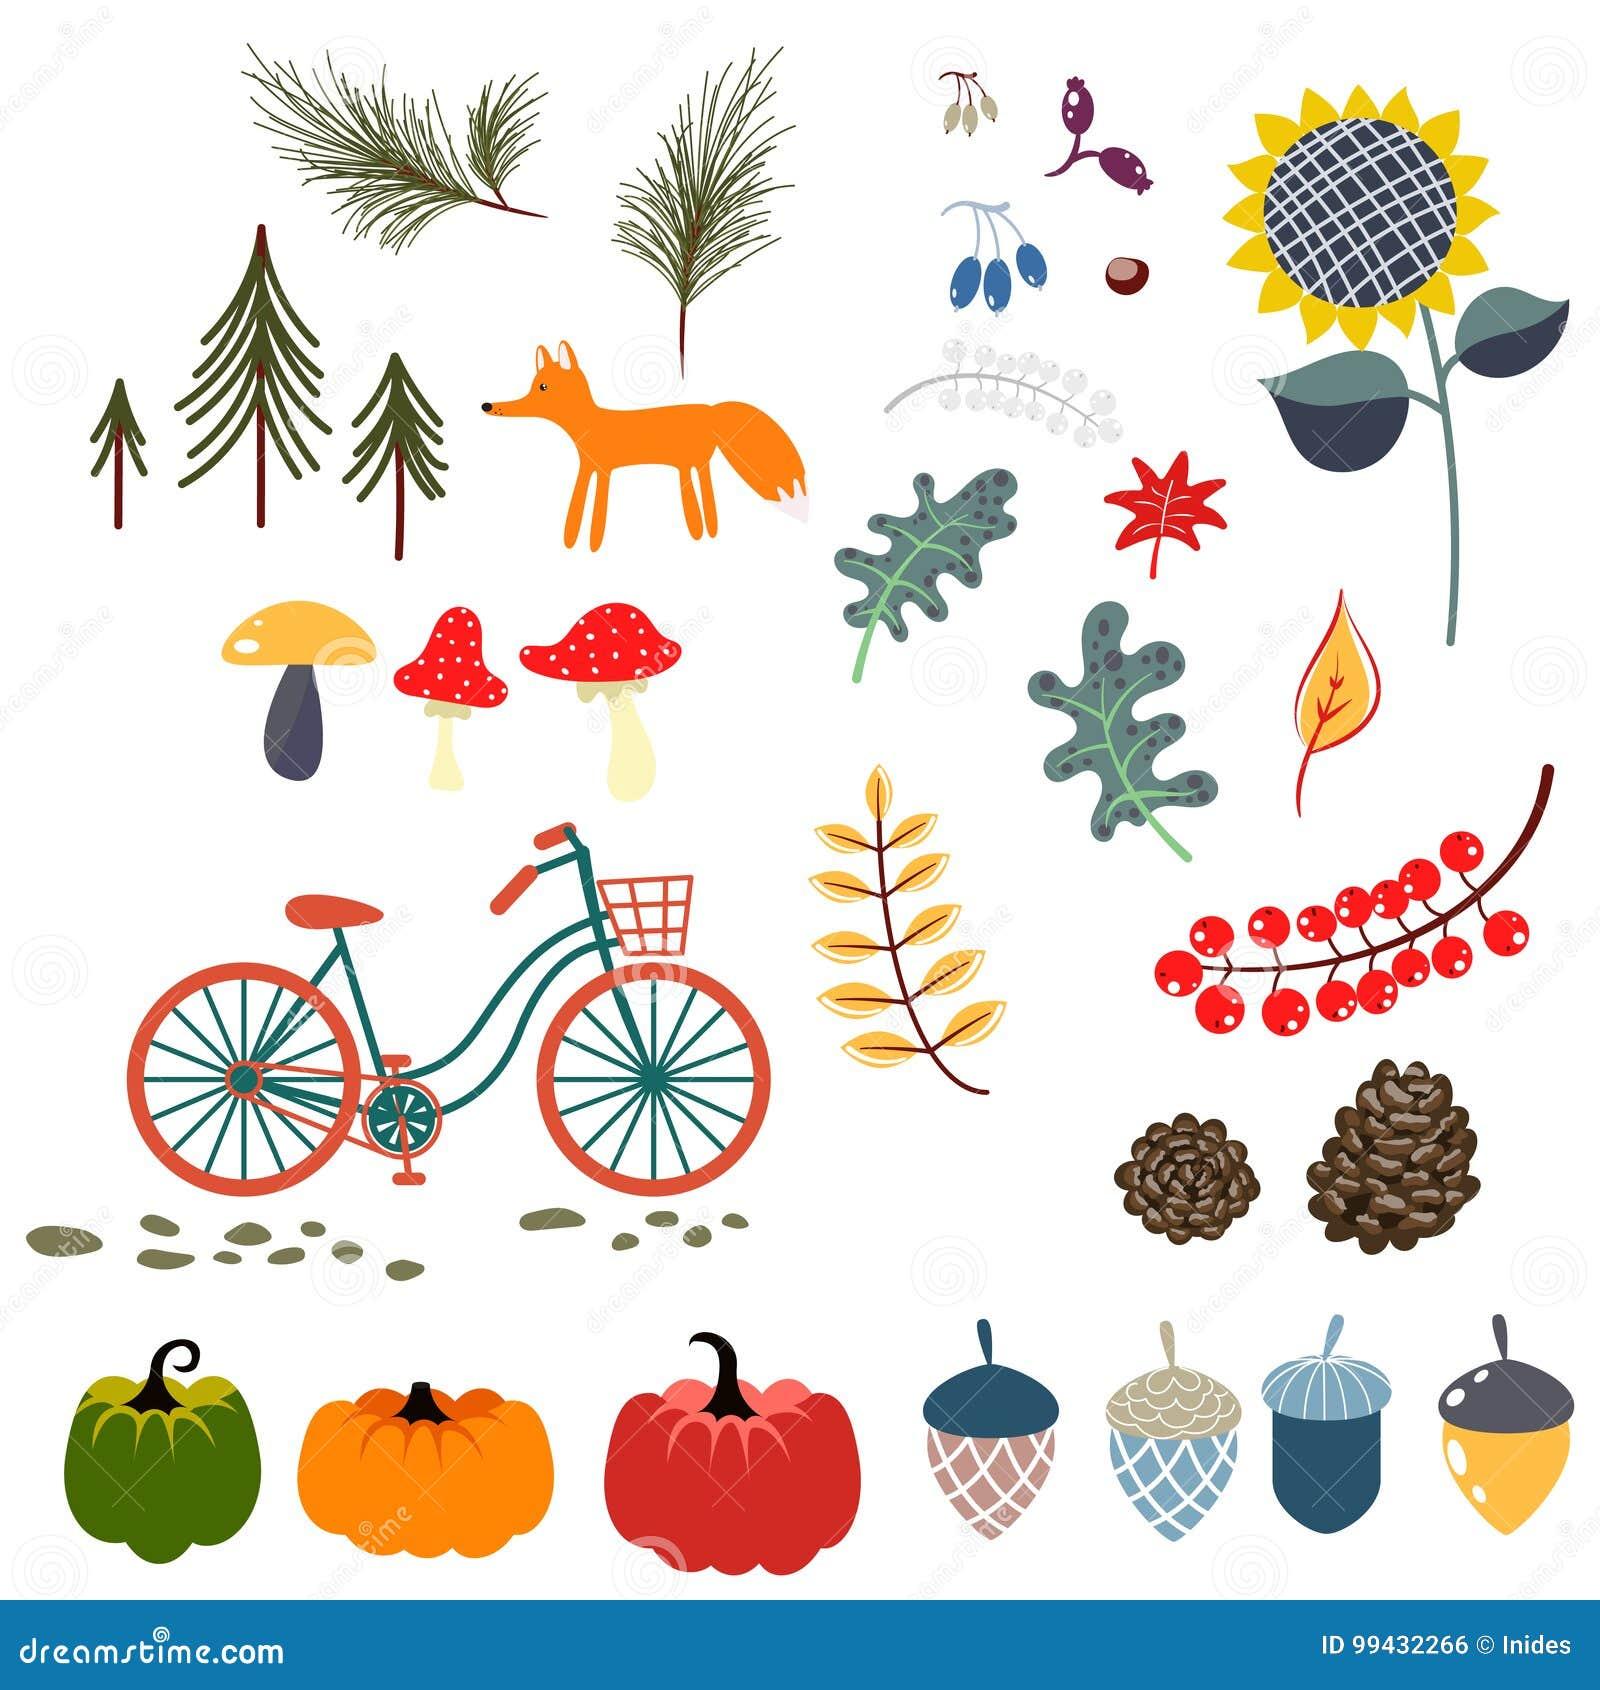 Autumn fall clip art vector illustrations.